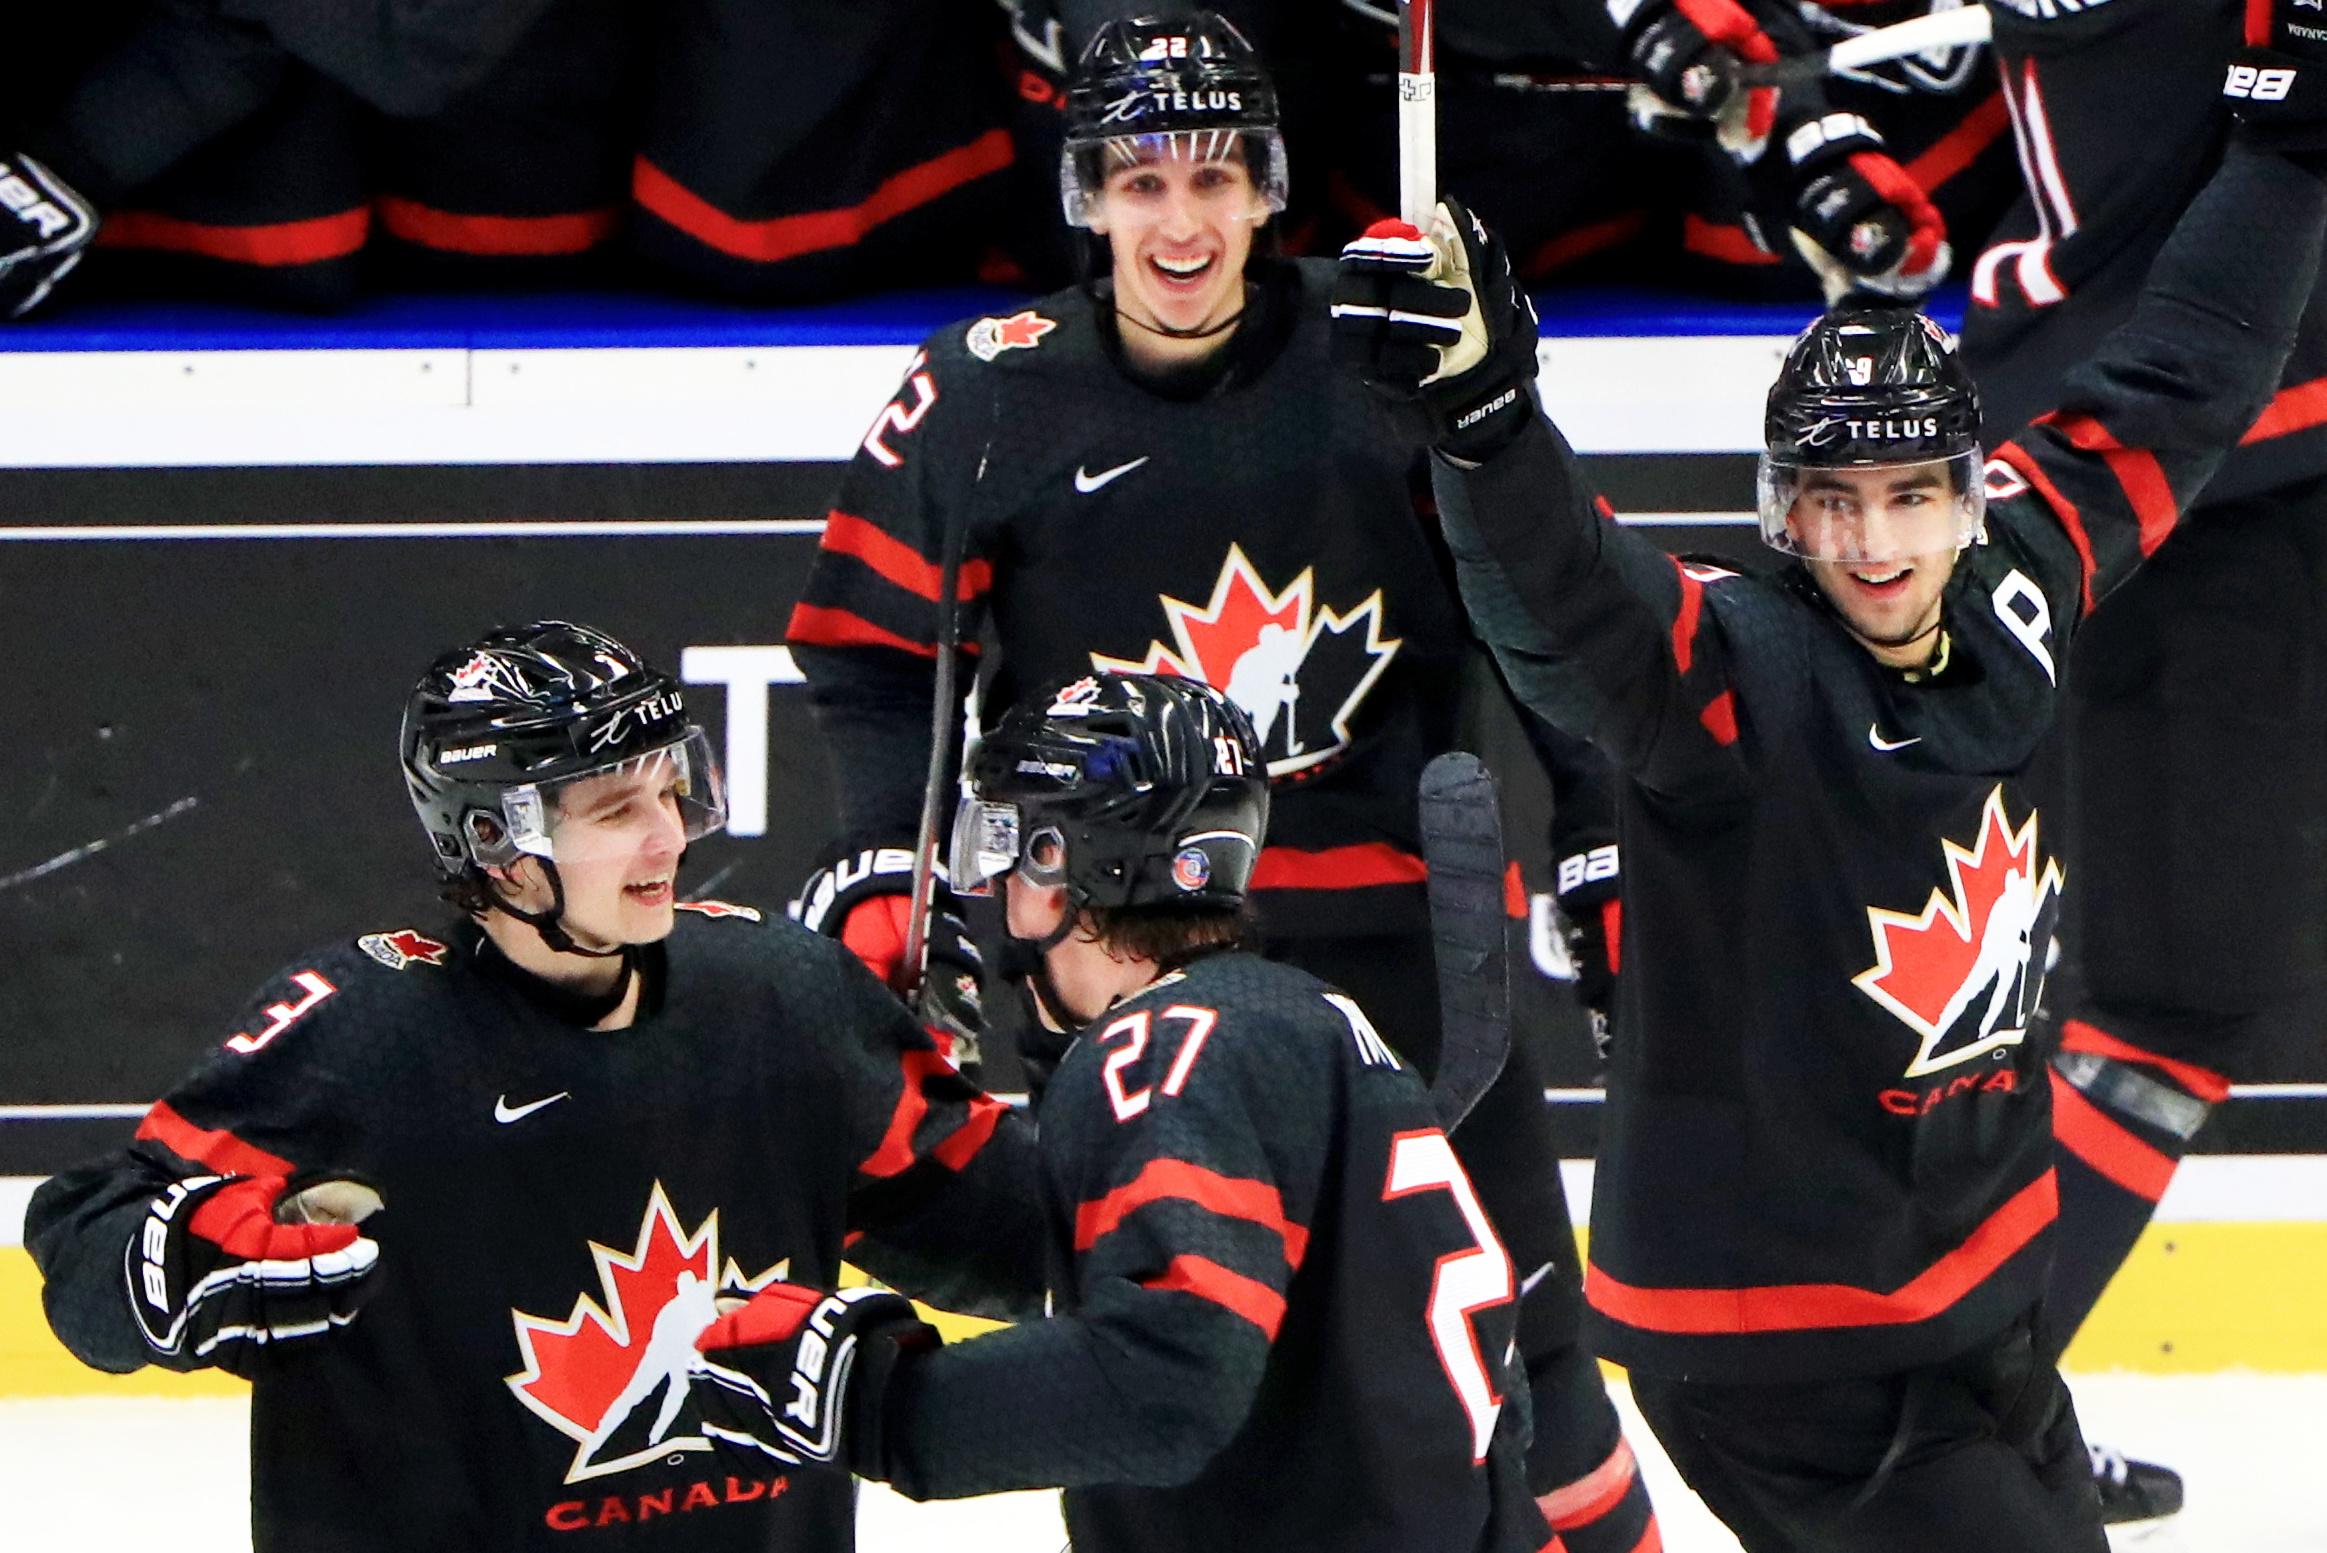 OSTRAVA, CZECH REPUBLIC - JANUARY 5, 2020: Canada's Calen Addison, Barrett Hayton, Joe Veleno (L-R front) and teammates celebrate a goal in the 2020 World Junior Ice Hockey Championship final match between Canada and Russia at Ostravar Arena.